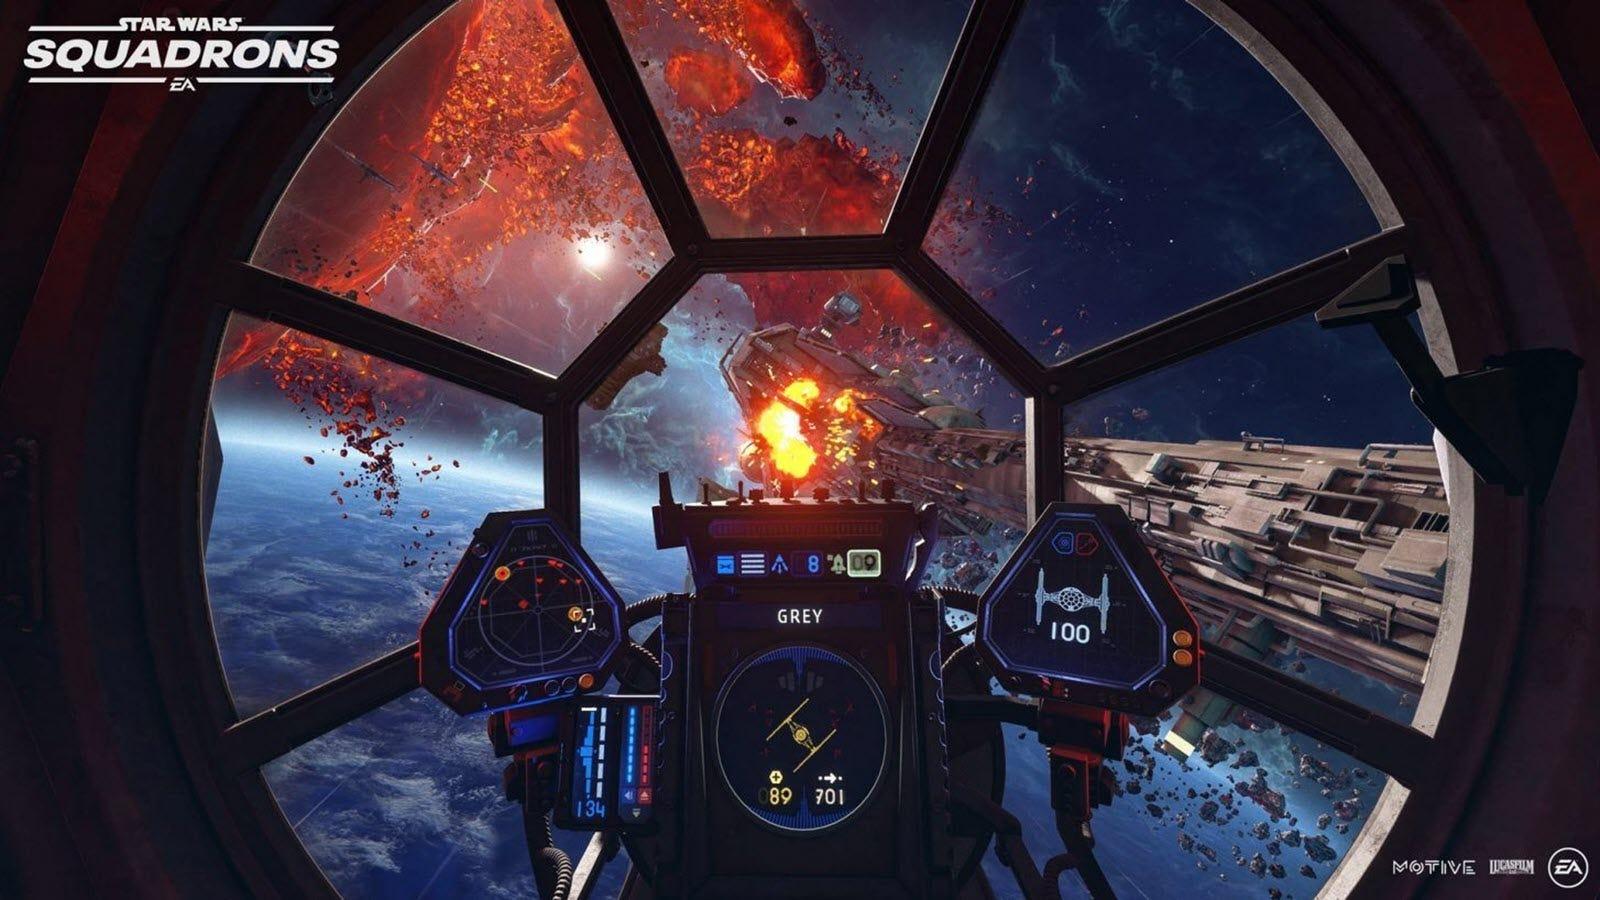 'Star Wars: Squadrons'